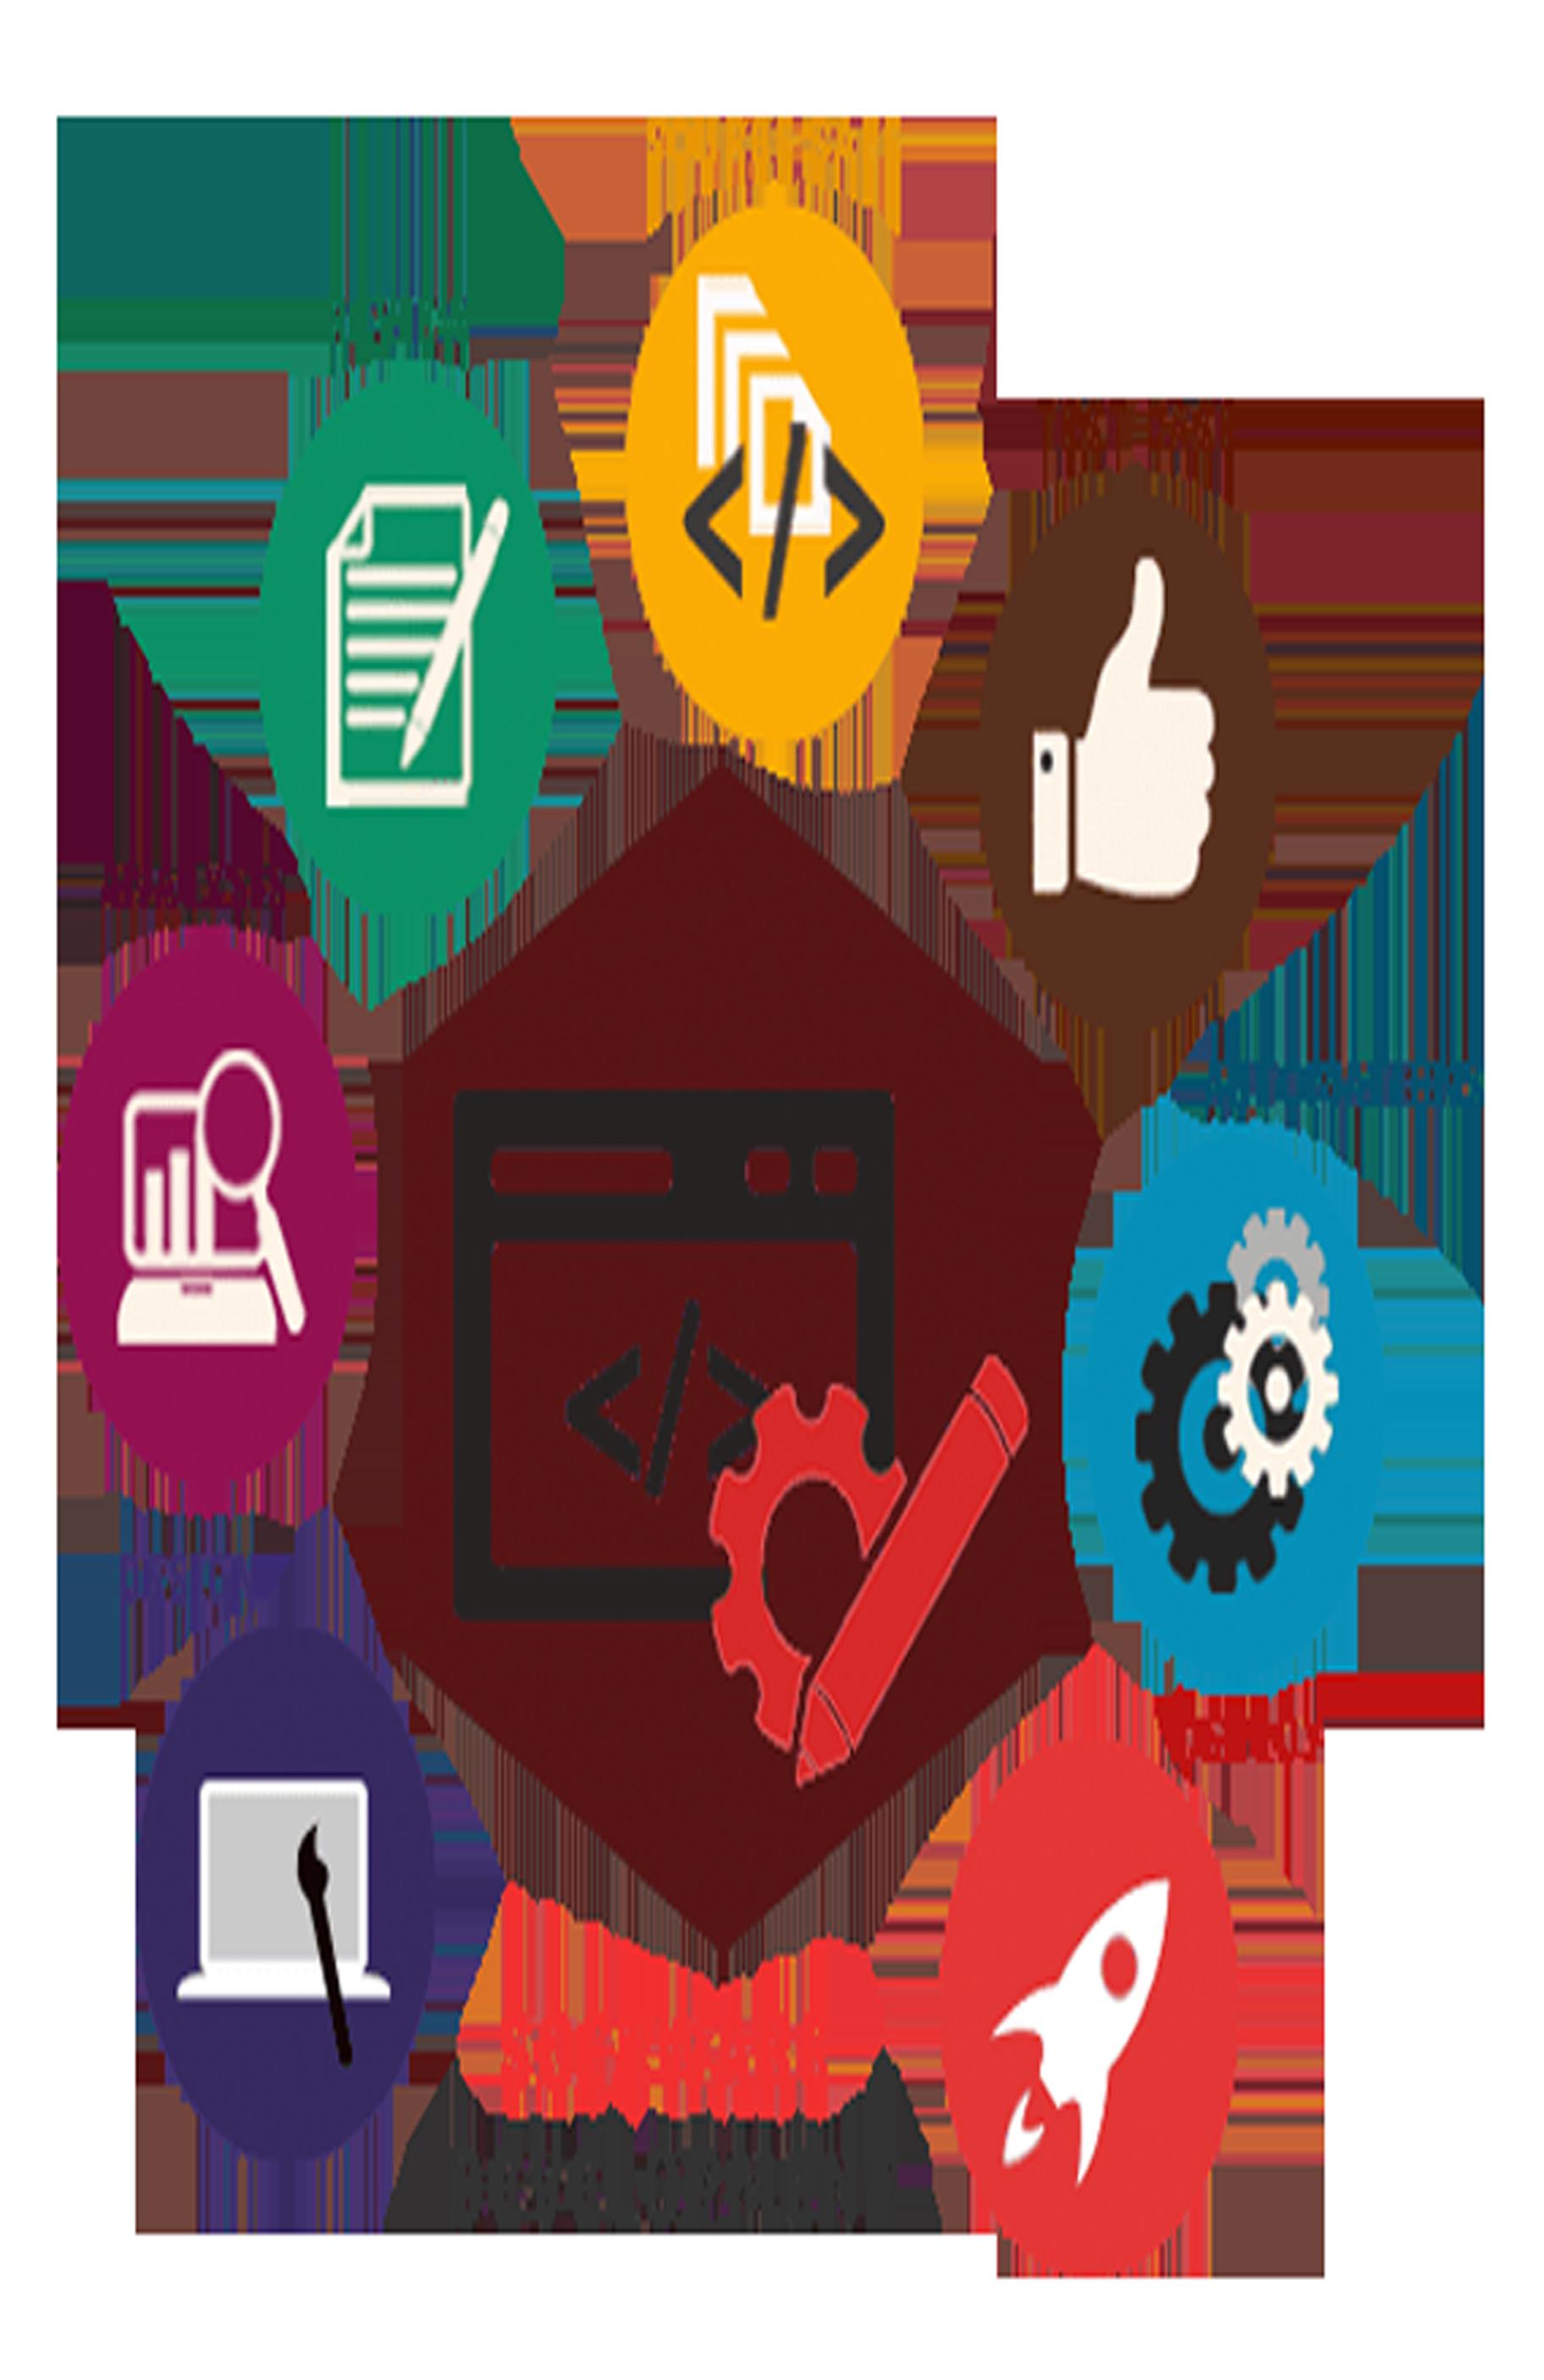 Mlm software india delhi. Technology clipart info tech